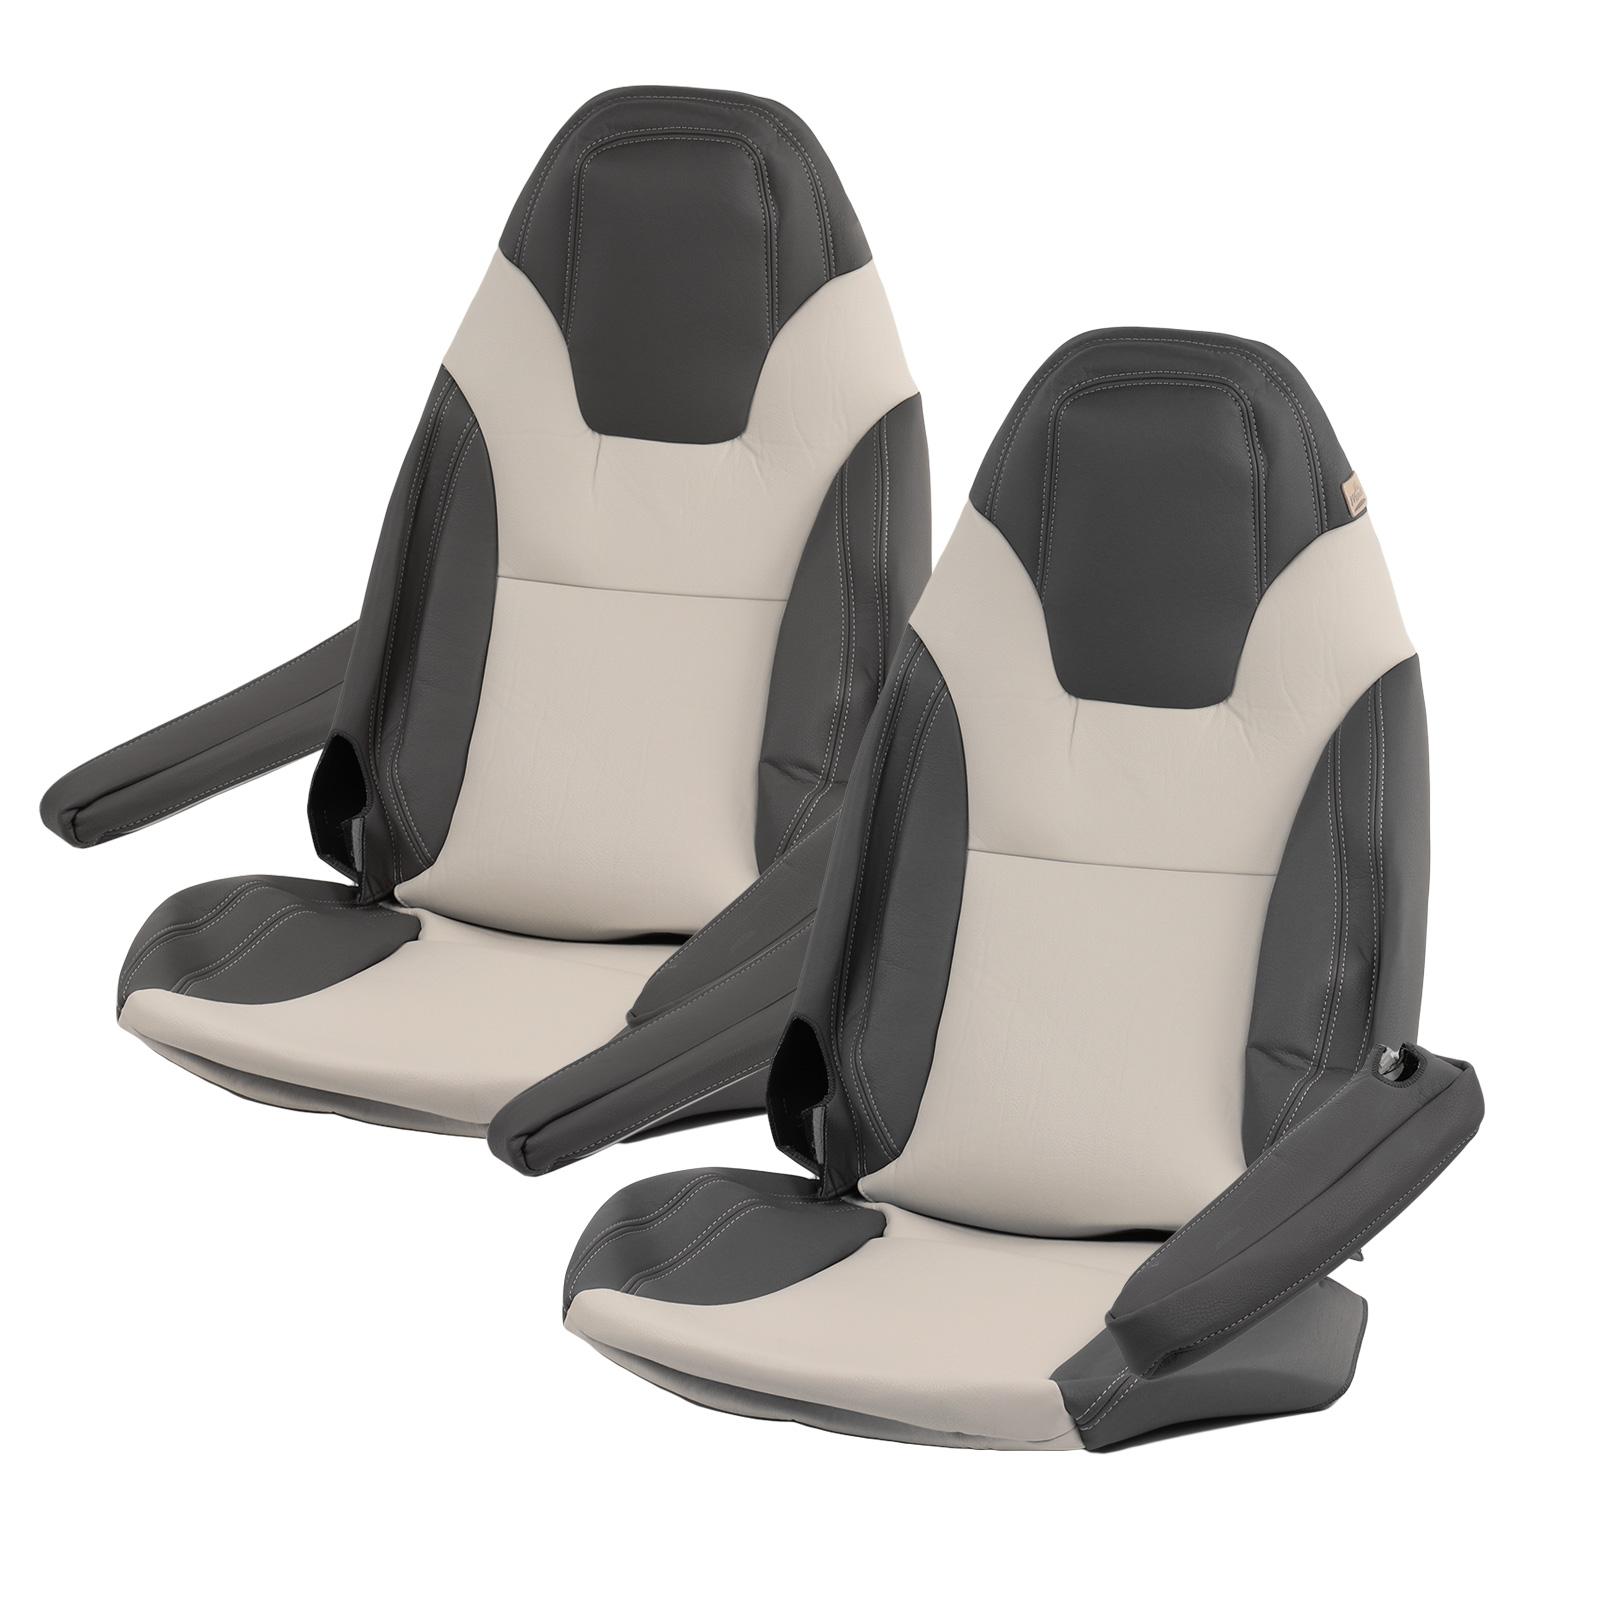 Maß Sitzbezüge | Fiat Ducato x290 | ab bj 2015 | Beige/Onyx | Kunstleder | 6tlg